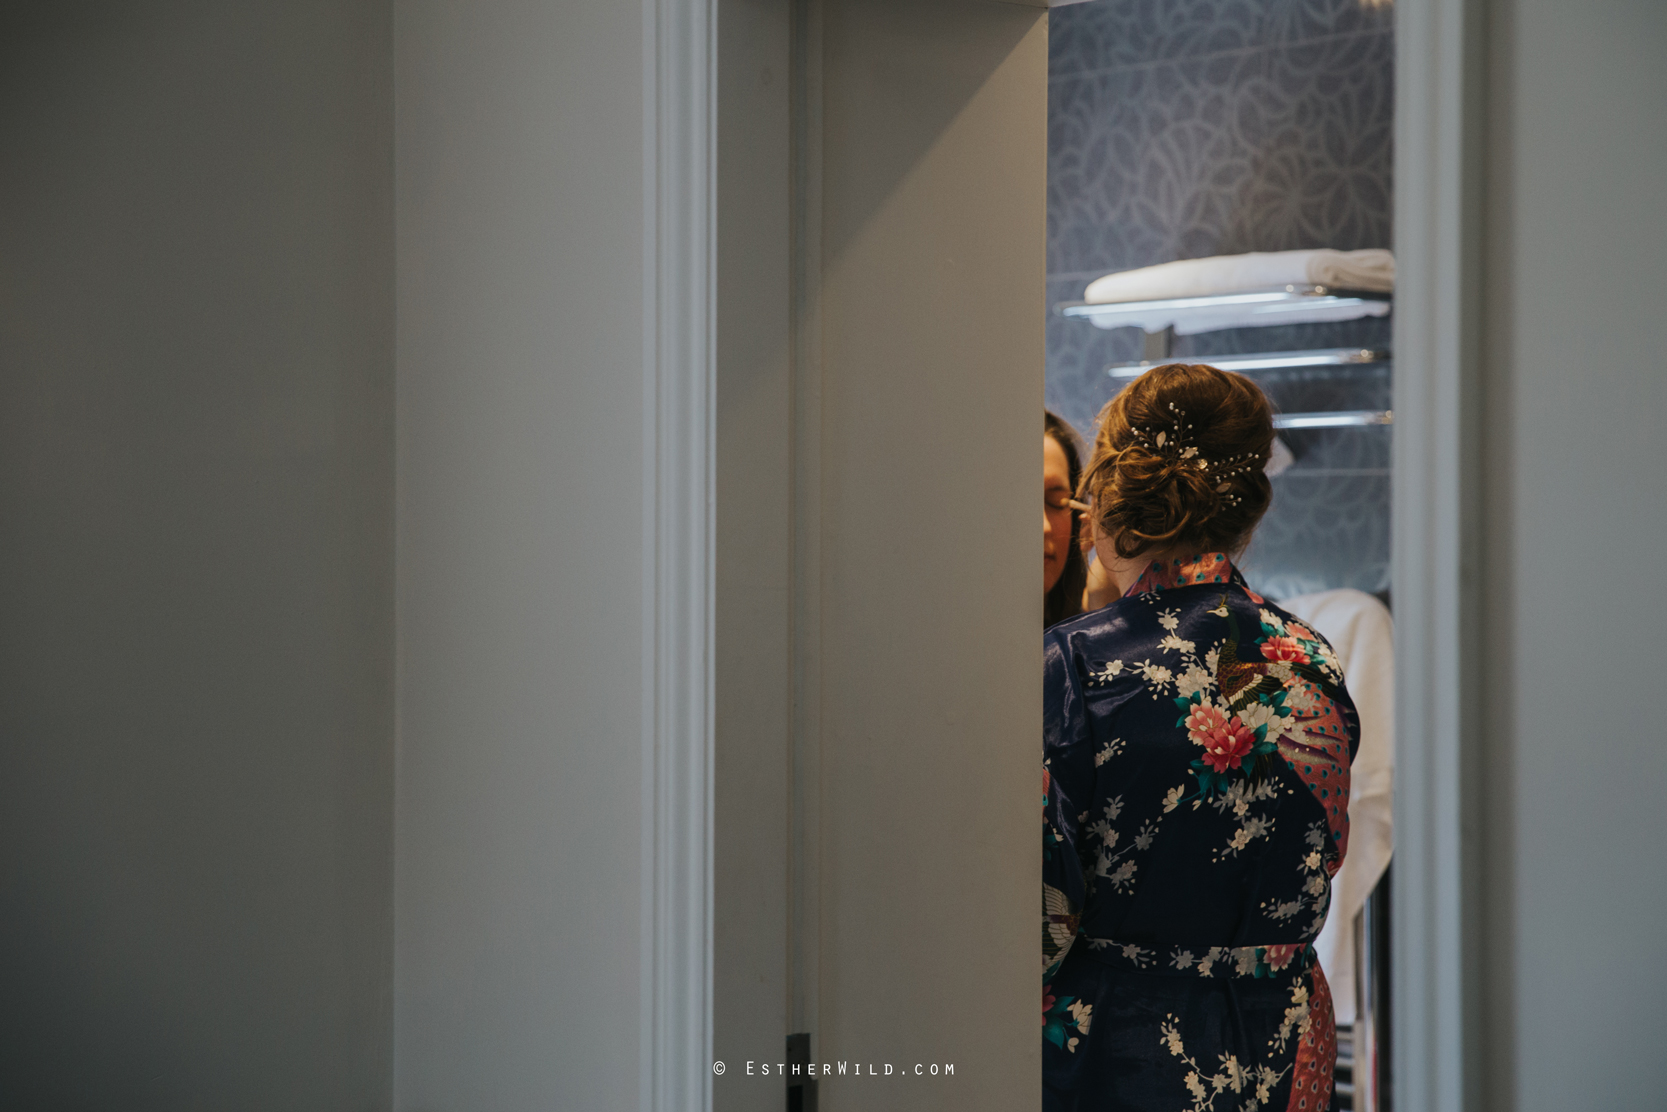 The_BoatHouse_Wedding_Venue_Ormesby_Norfolk_Broads_Boat_Wedding_Photography_Esther_Wild_Photographer_IMG_0278.jpg